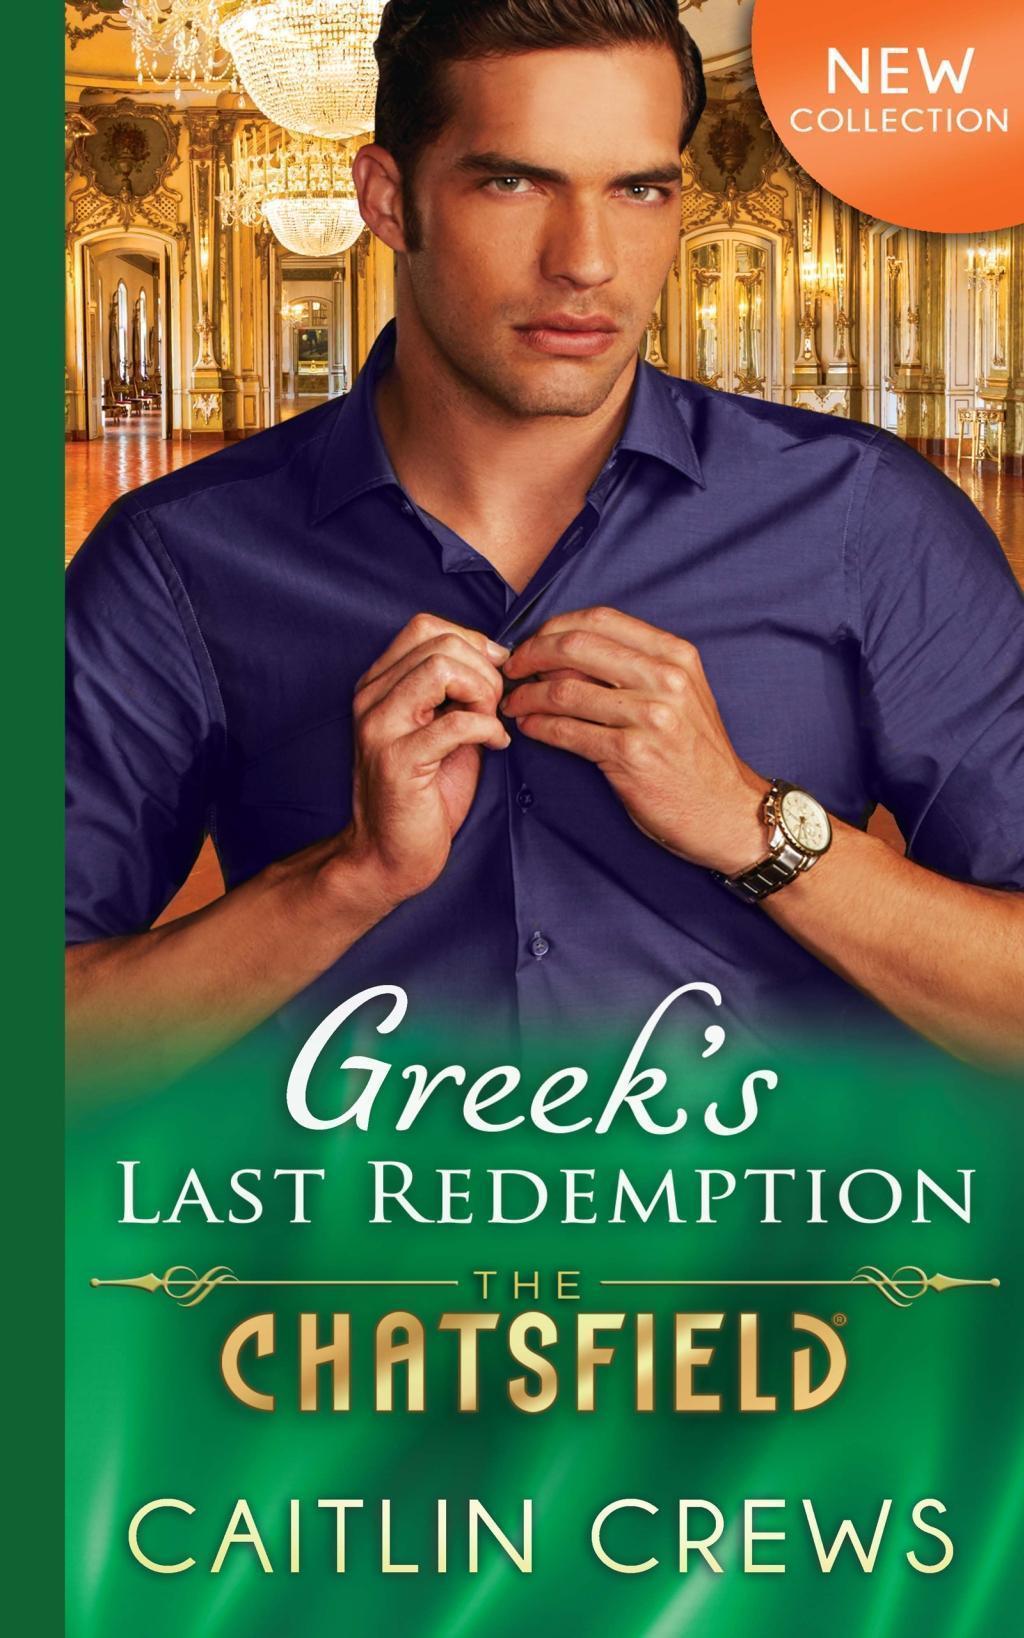 Greek's Last Redemption (Mills & Boon M&B) (The Chatsfield, Book 13)